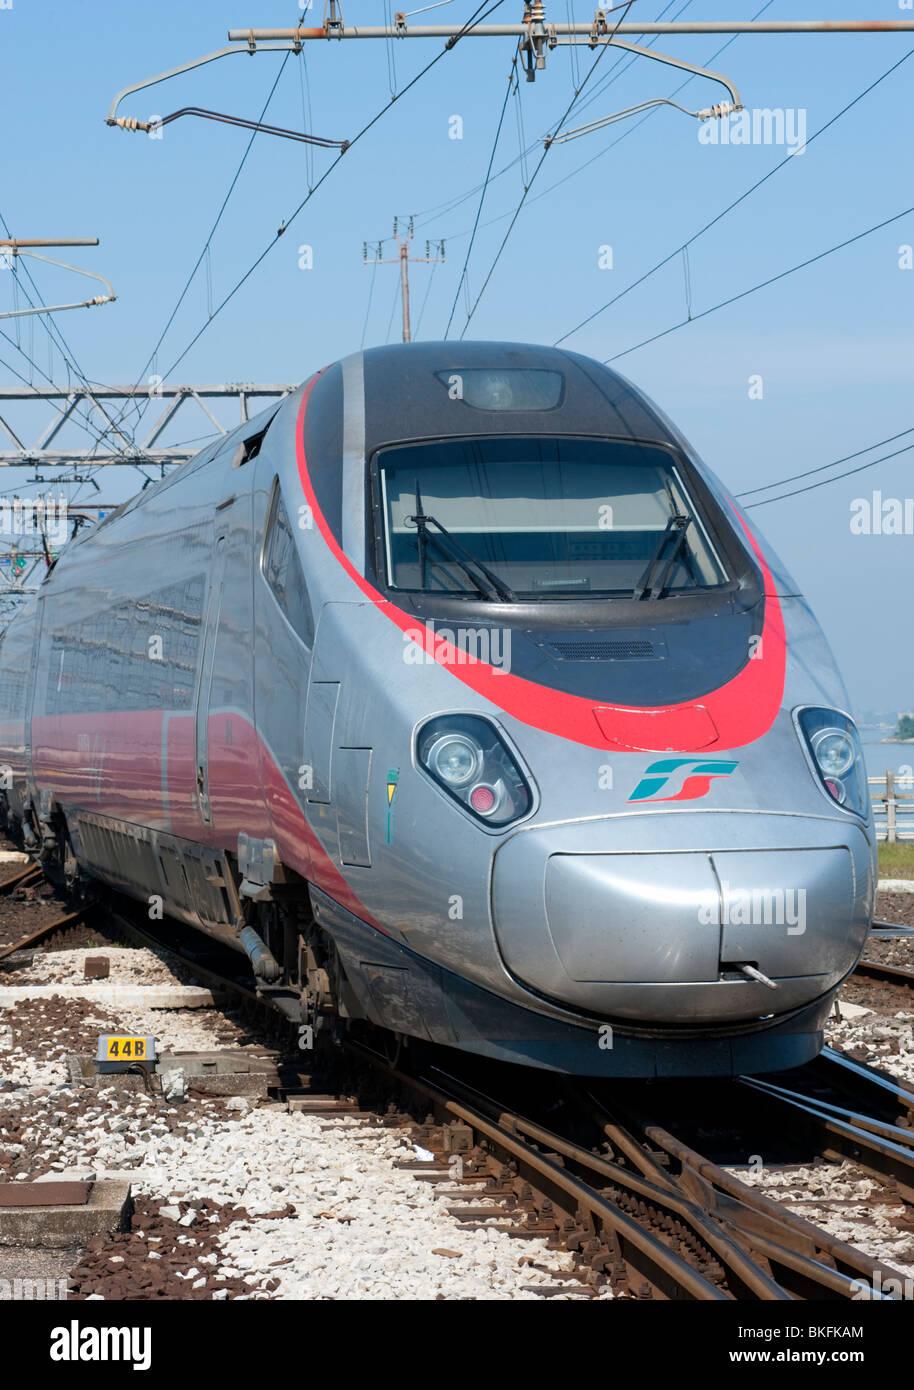 High speed Italian Eurostar train at Venice railway station in Italy - Stock Image